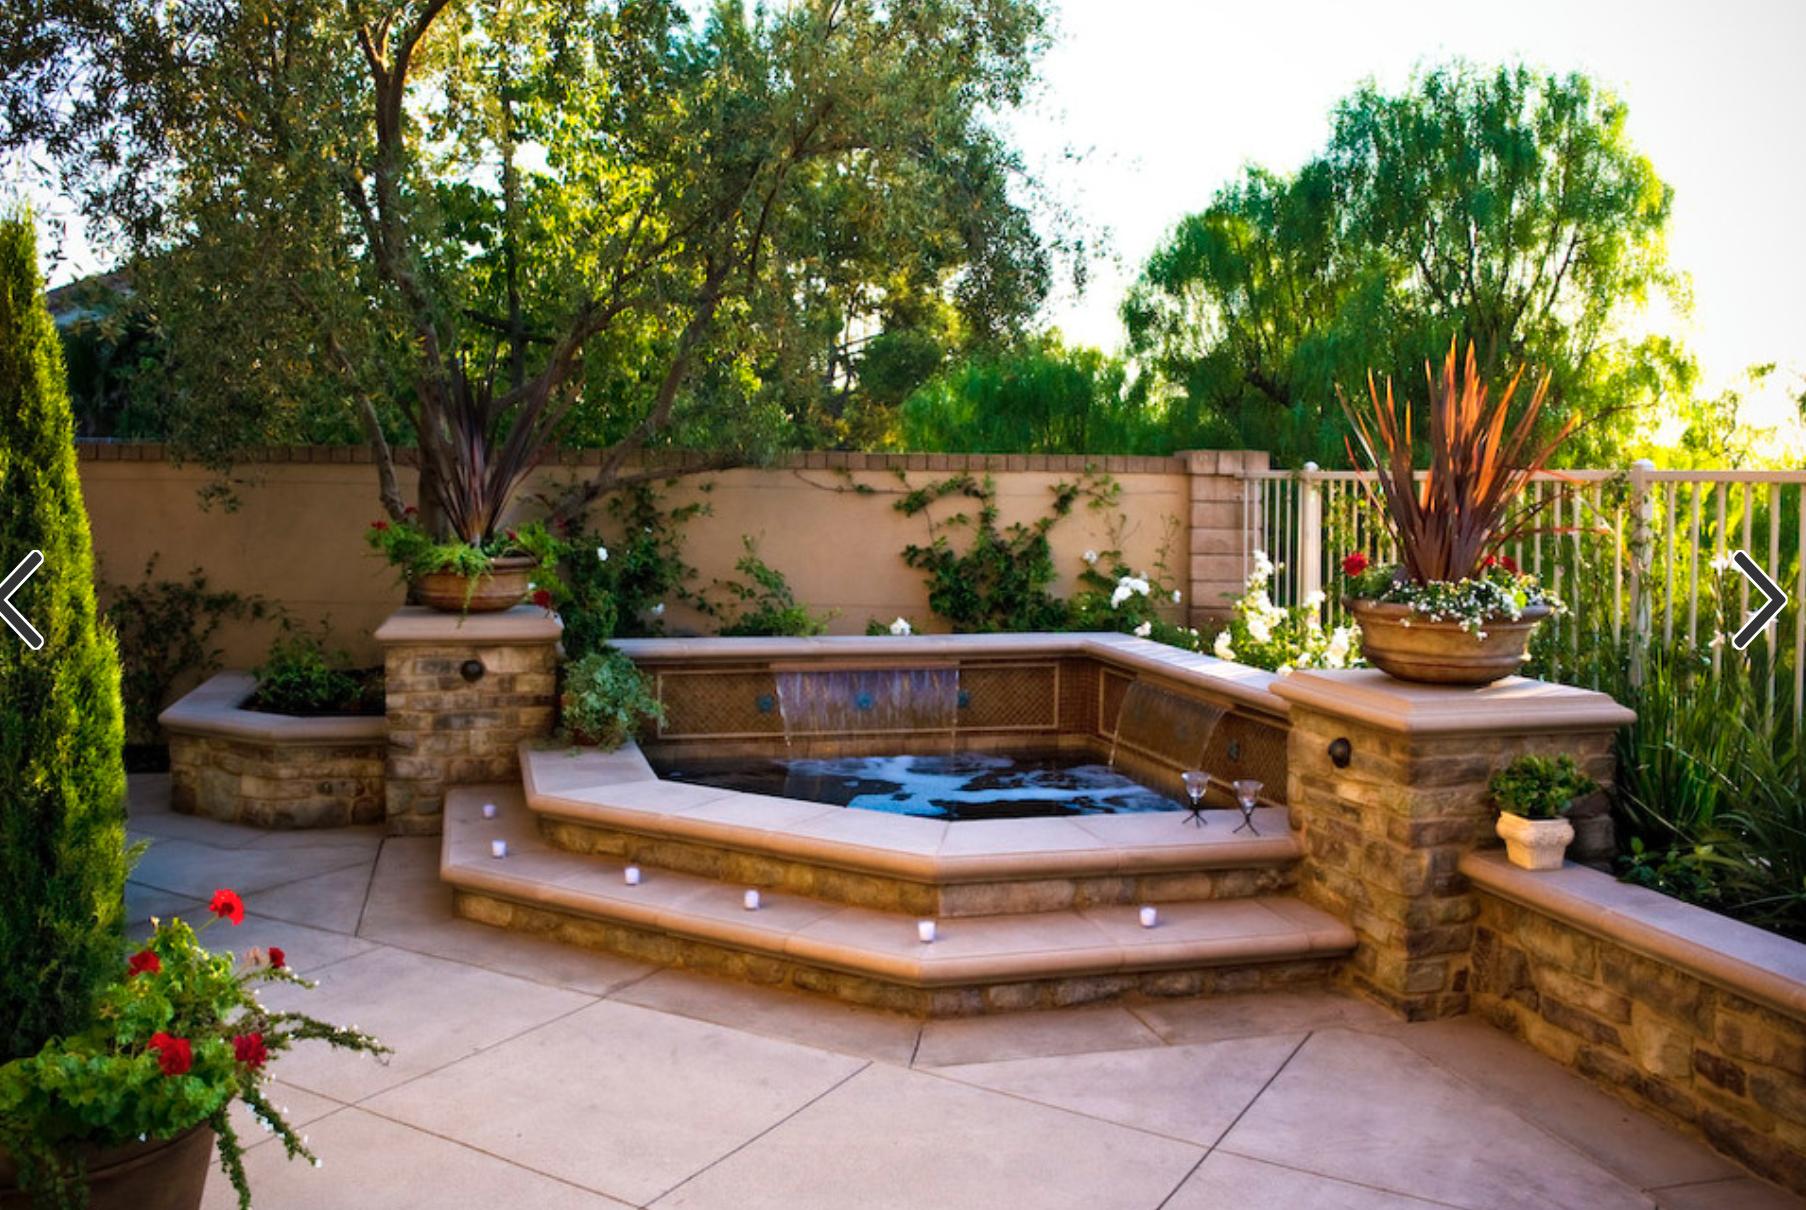 Backyard 39spool39 Hot Tub Pool For Downward Slope In